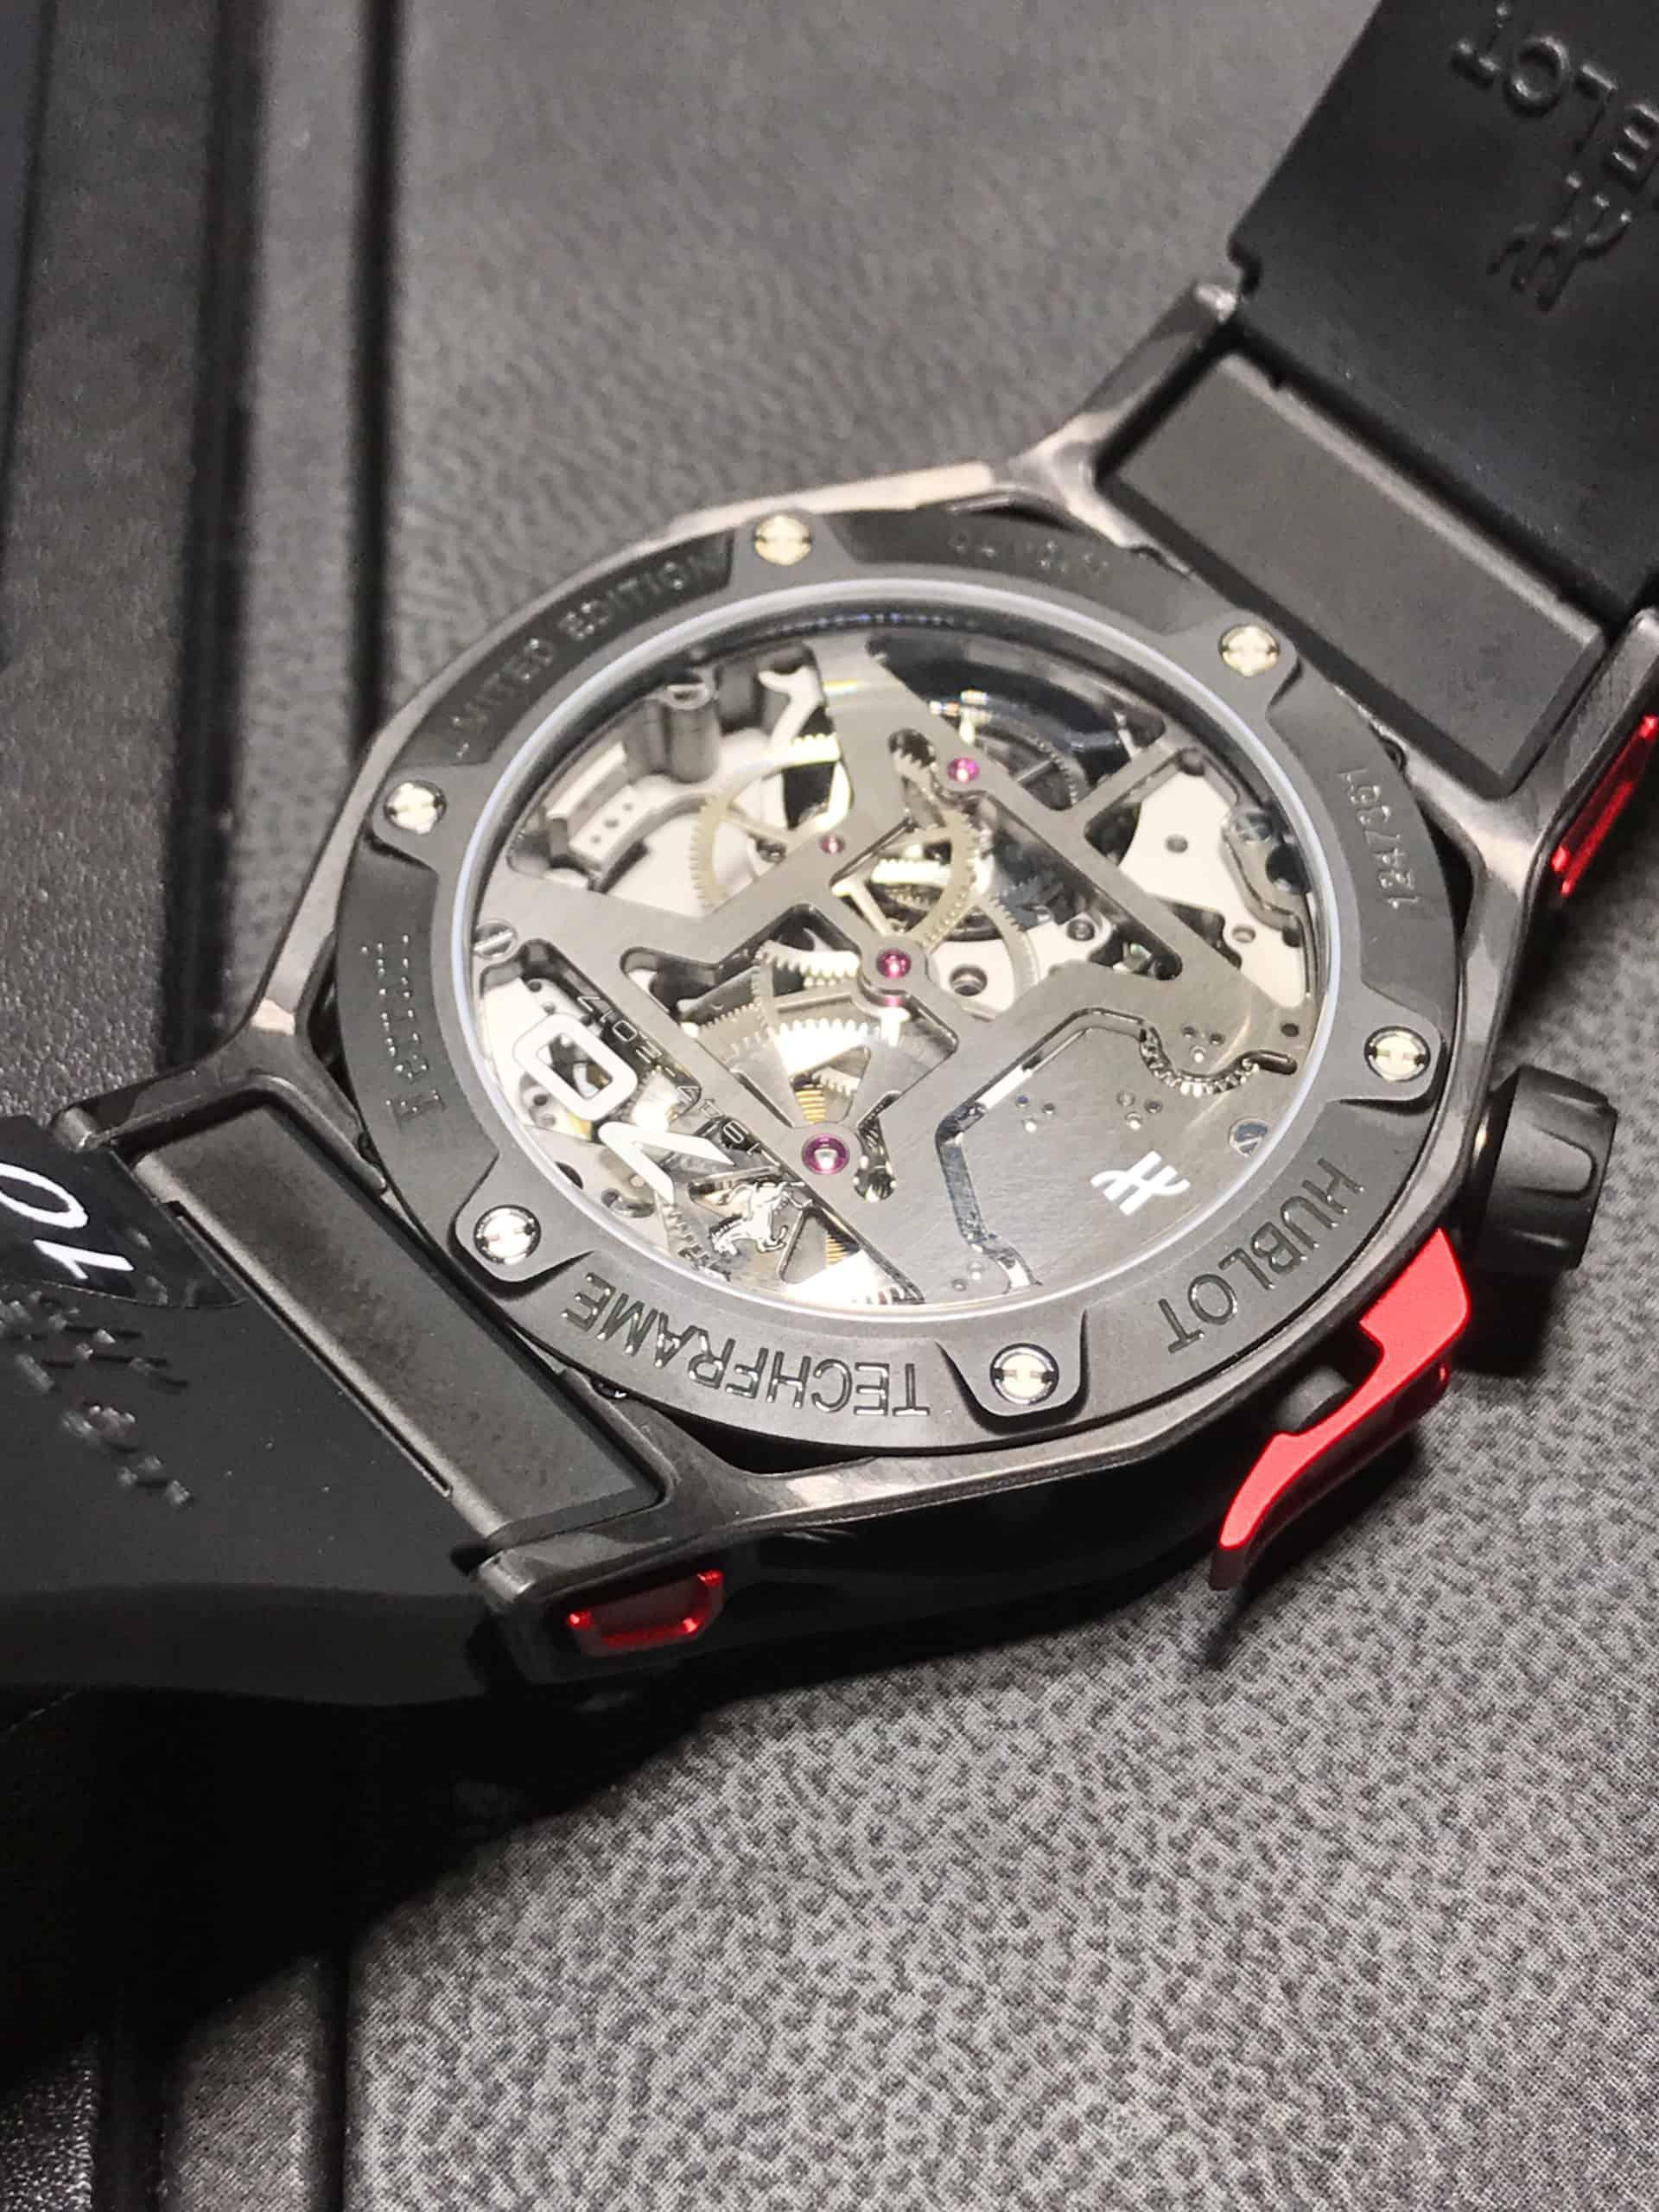 Hublot . Techframe Ferrari 70 years Tourbillon Chronograph - 2017-5